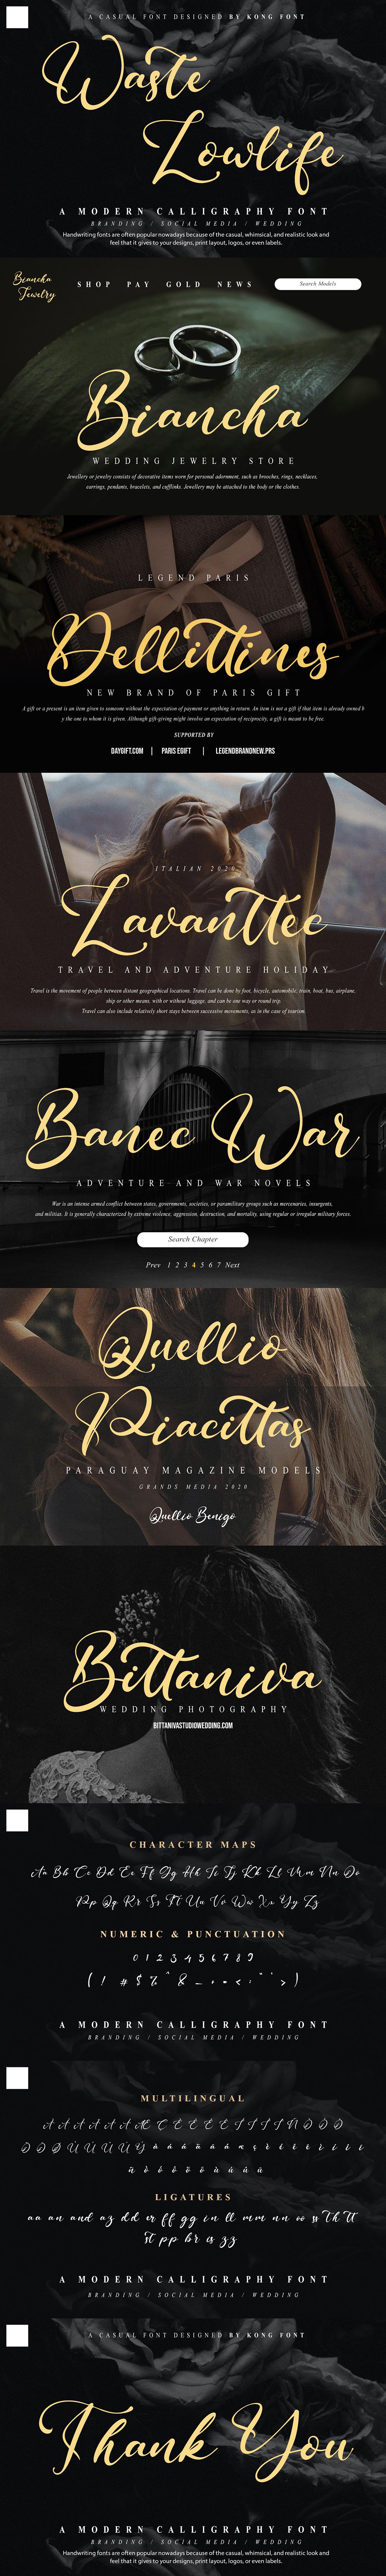 branding  Calligraphy   designfont font jewelry lettering Logotype modern Script waste lowlife